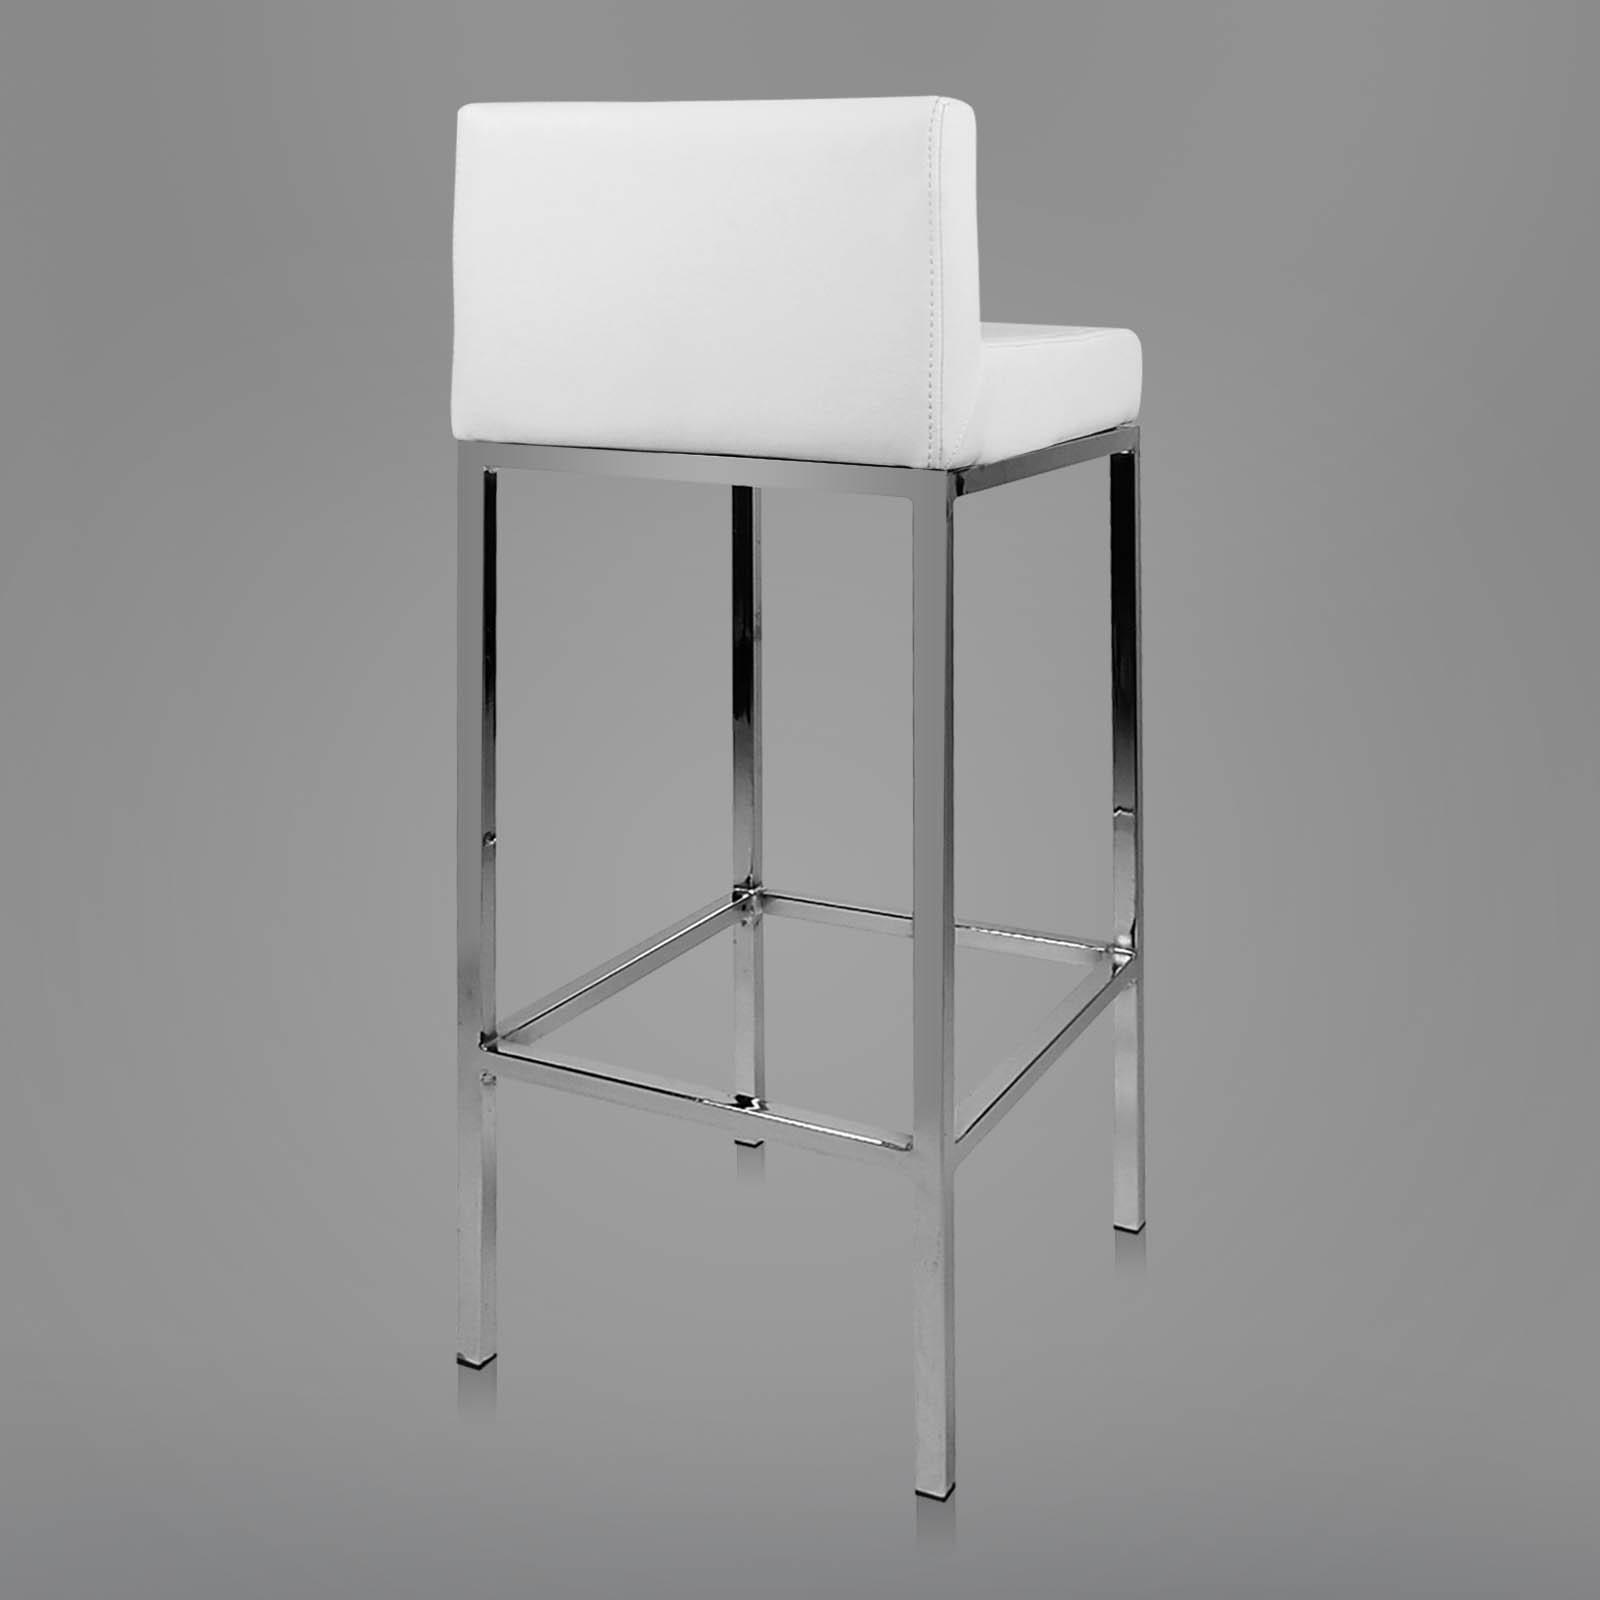 bar stool chair legs vecta office 2x pu leather modern kitchen barstool